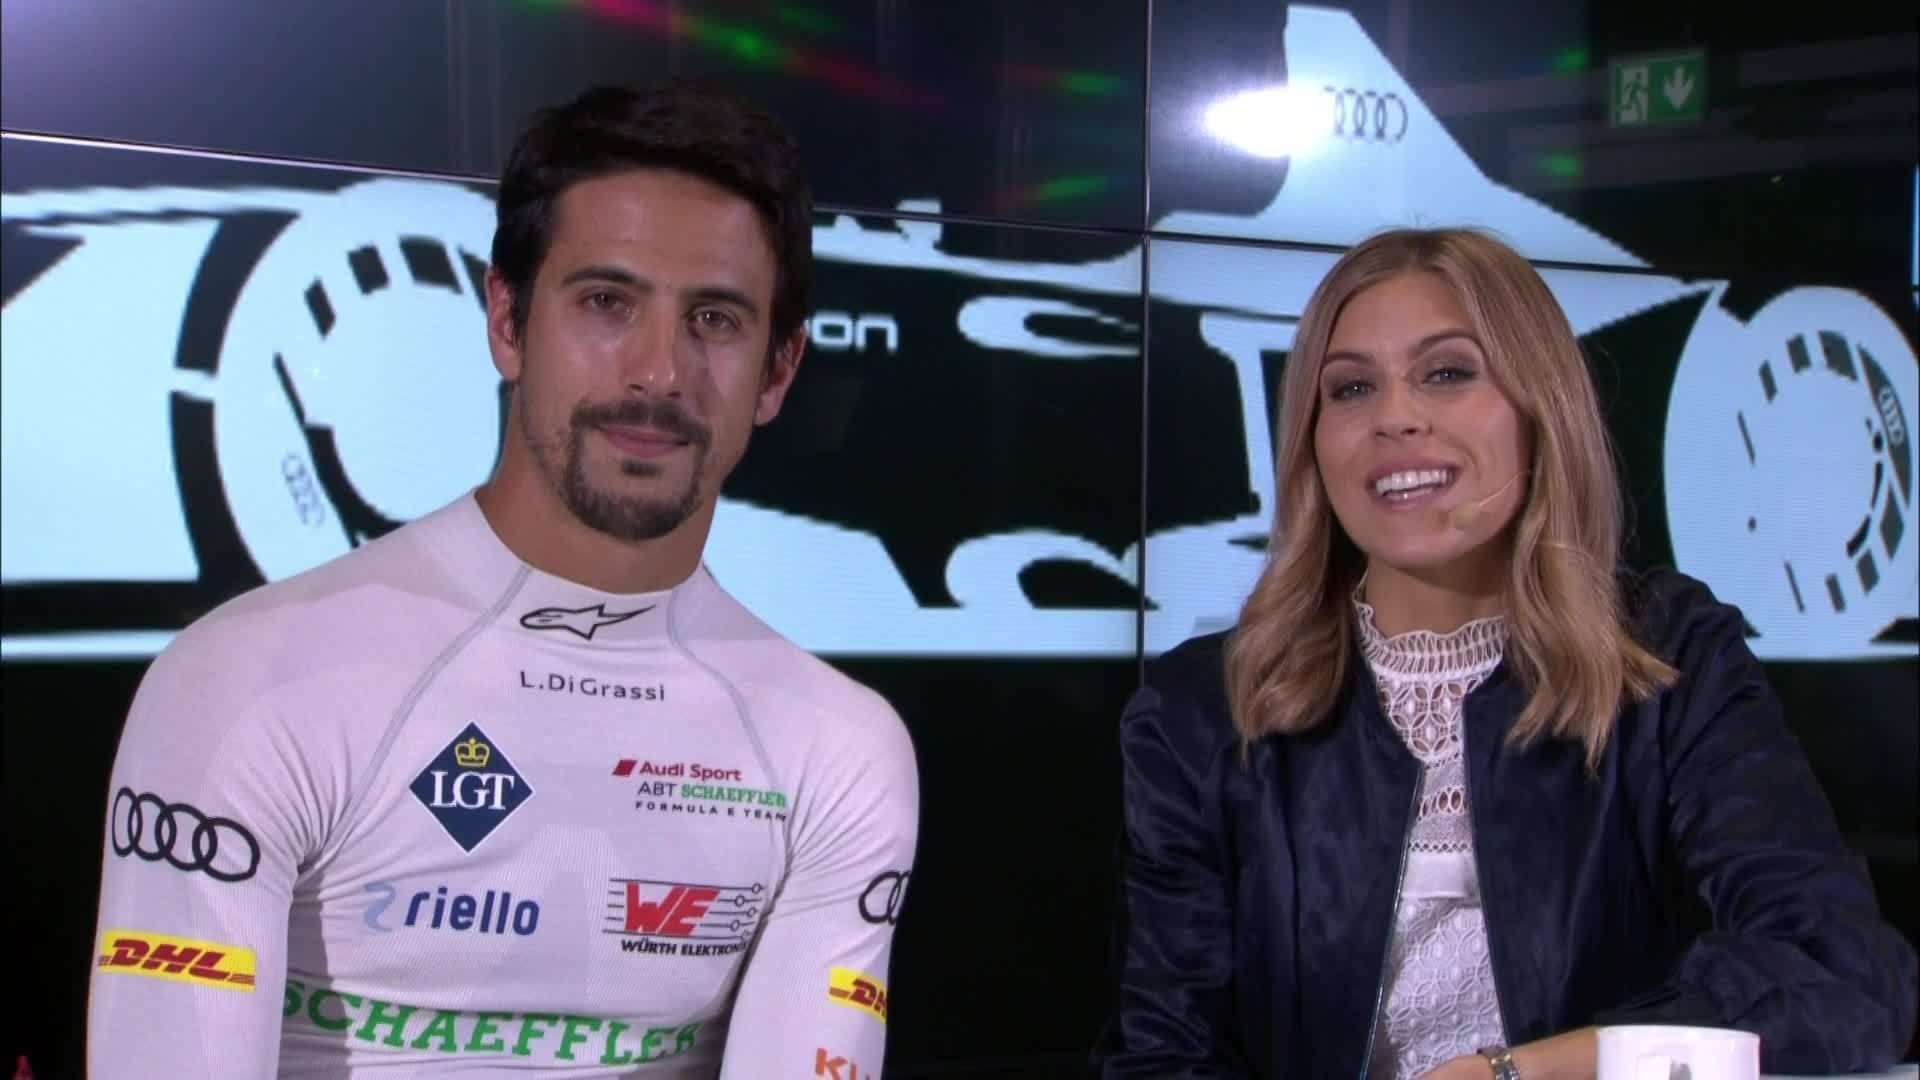 Q&A Formel E Team Präsentation